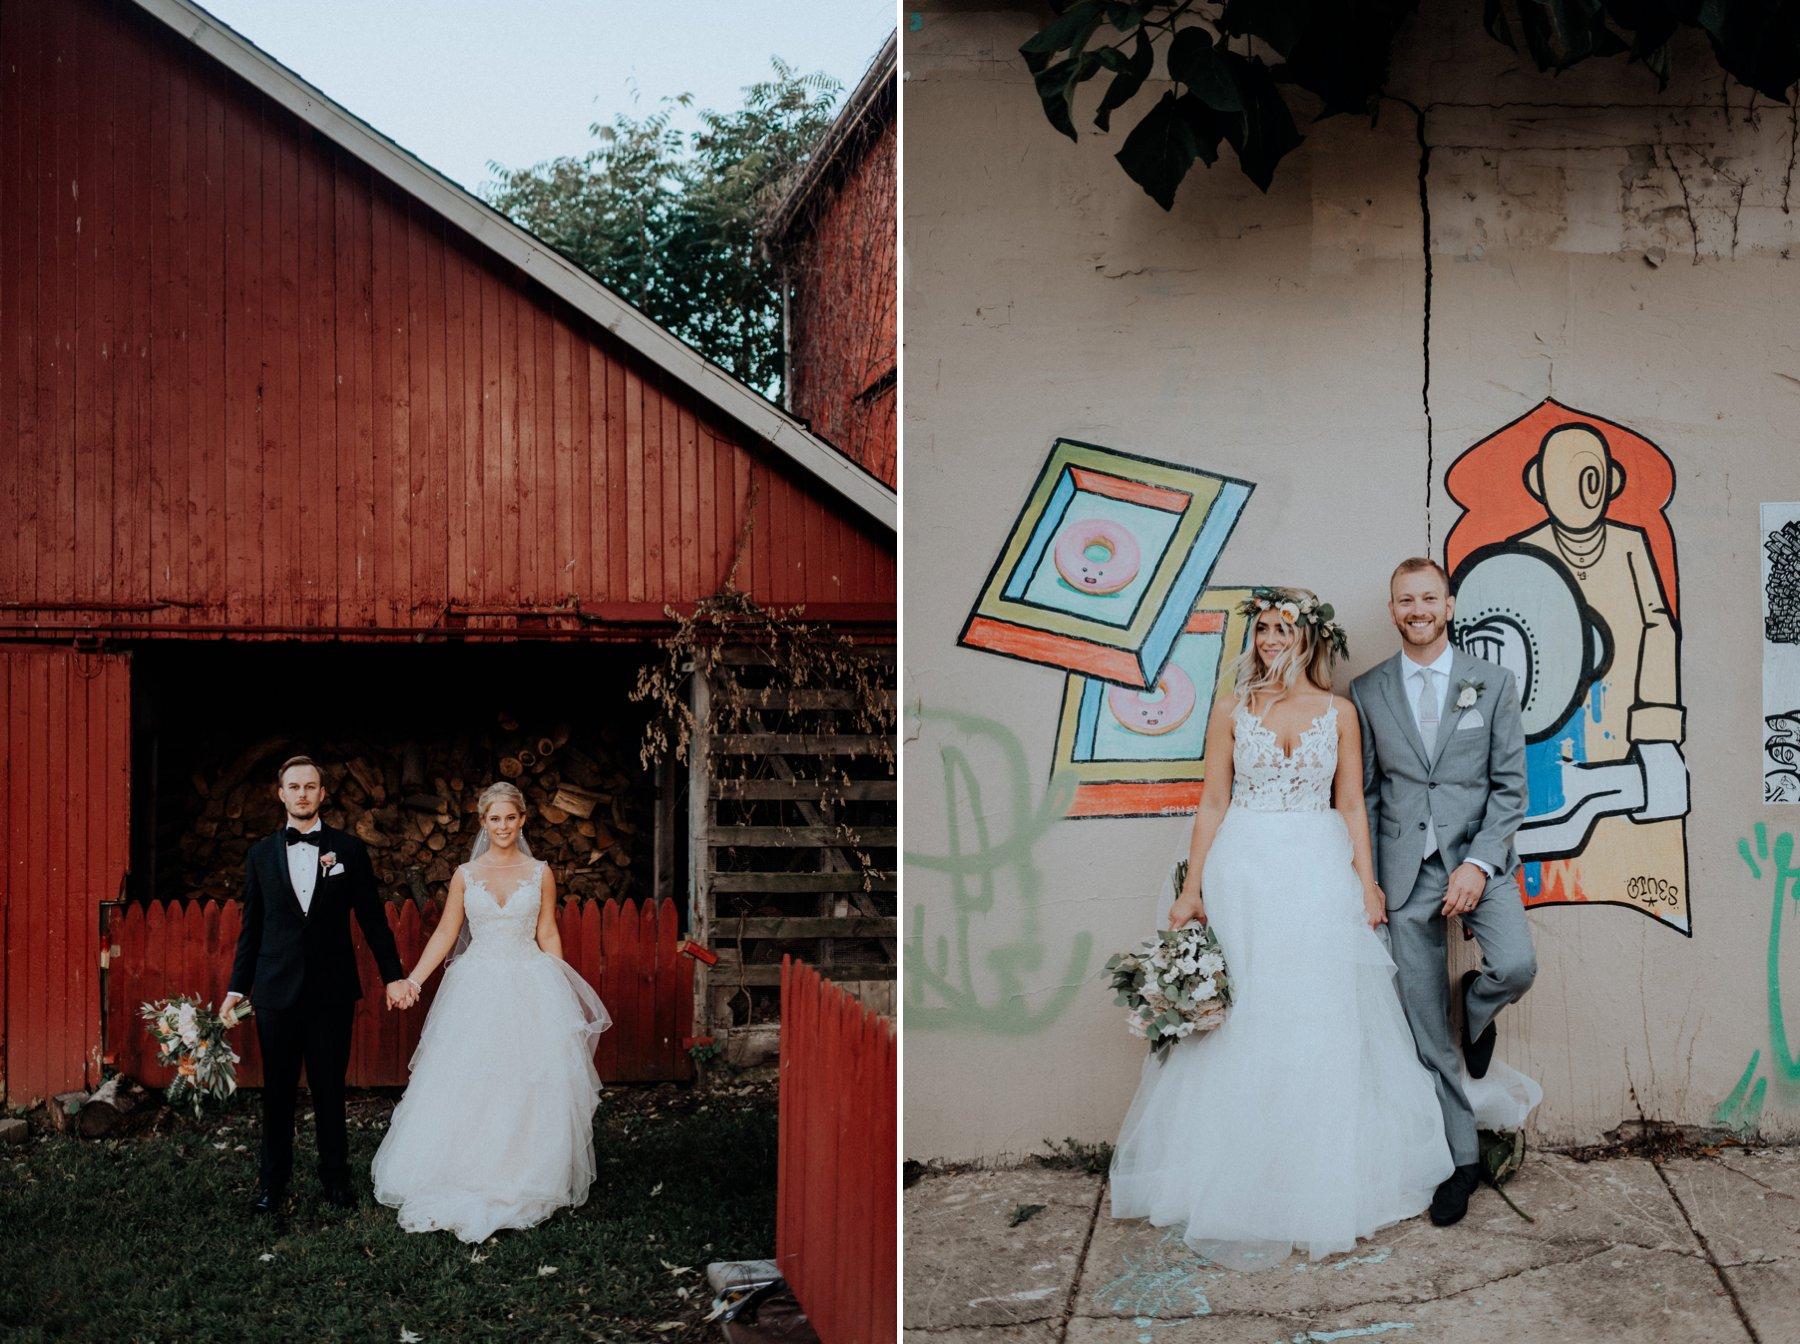 072-049-Manor-house-at-prophecy-creek-wedding-17.jpg